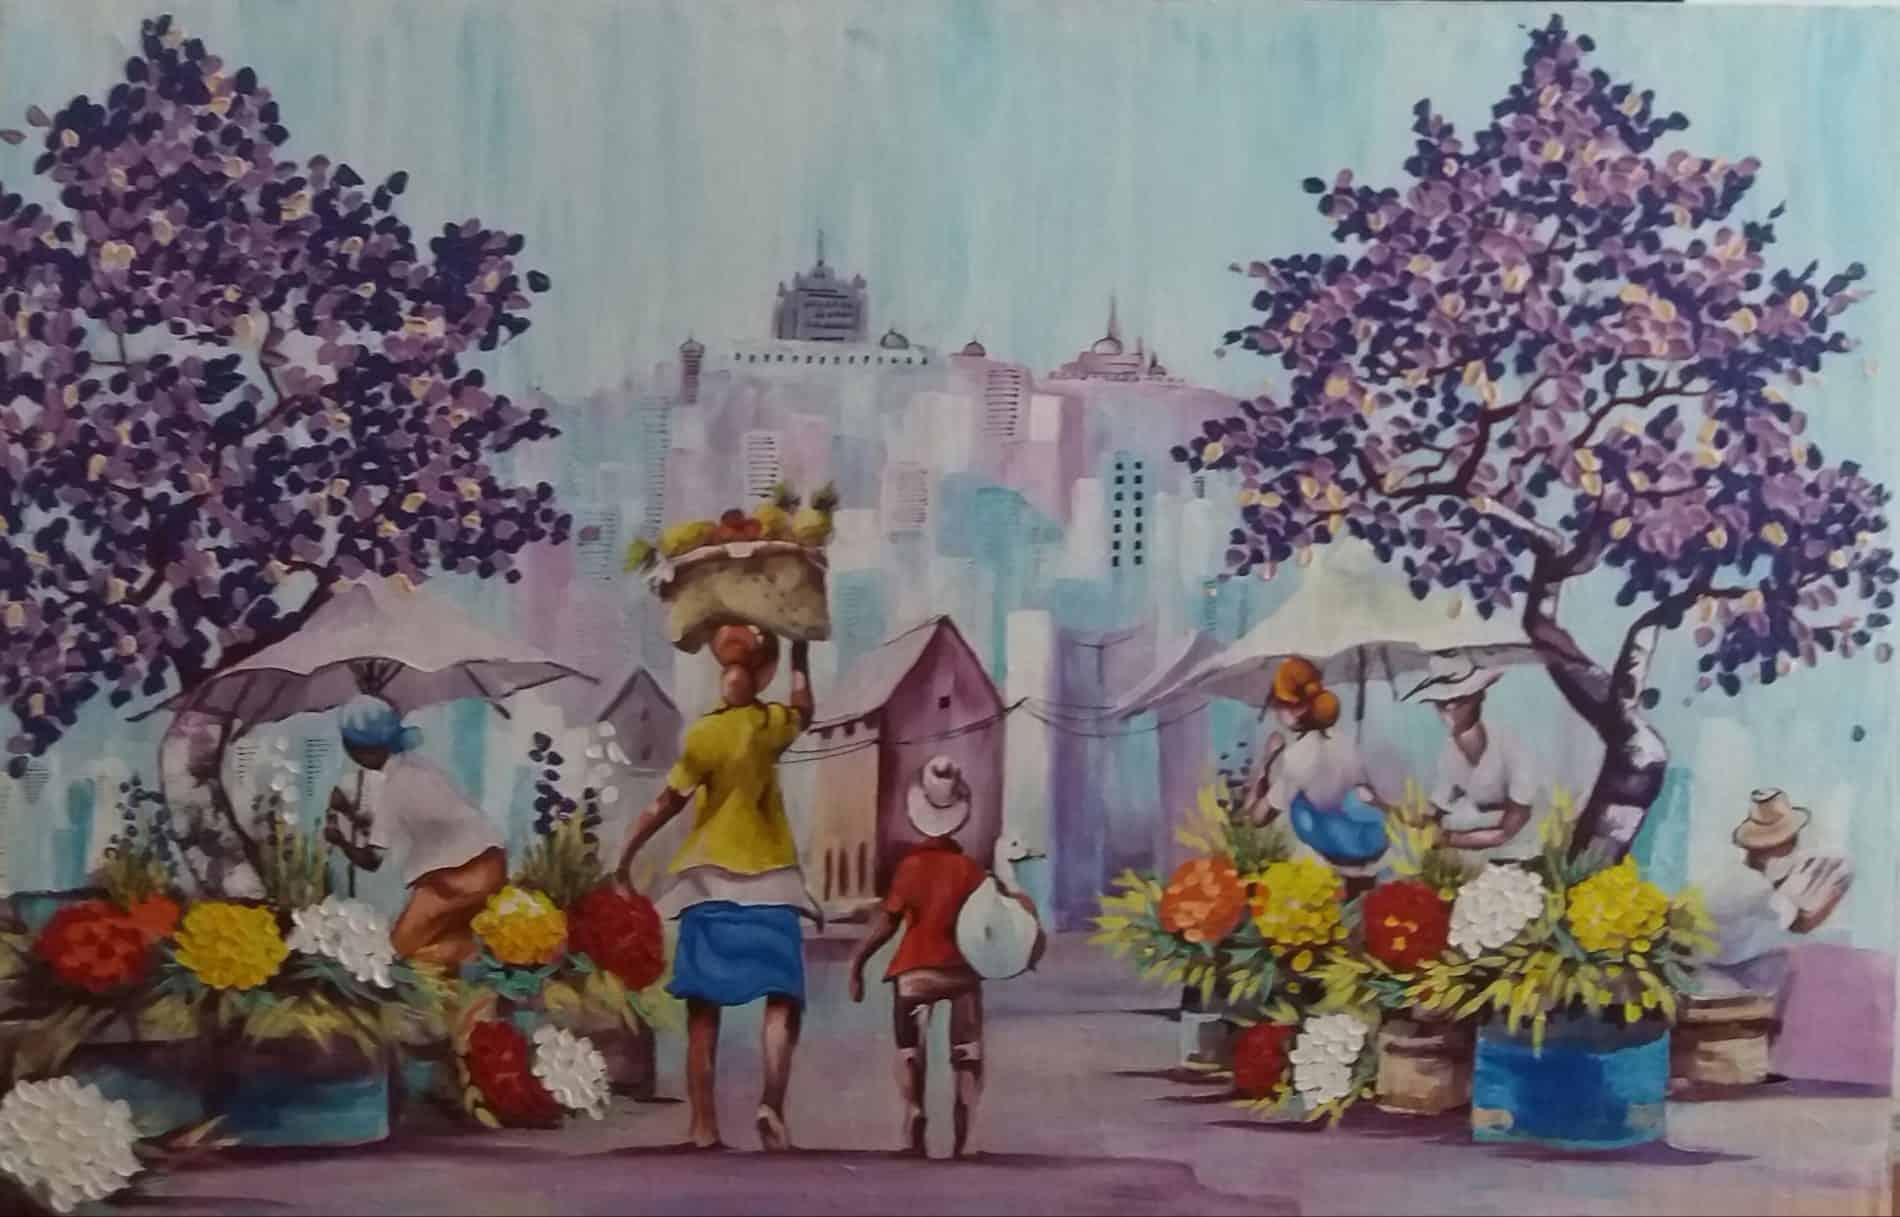 mauritius_arts_hurreeram_andhya_market_scene